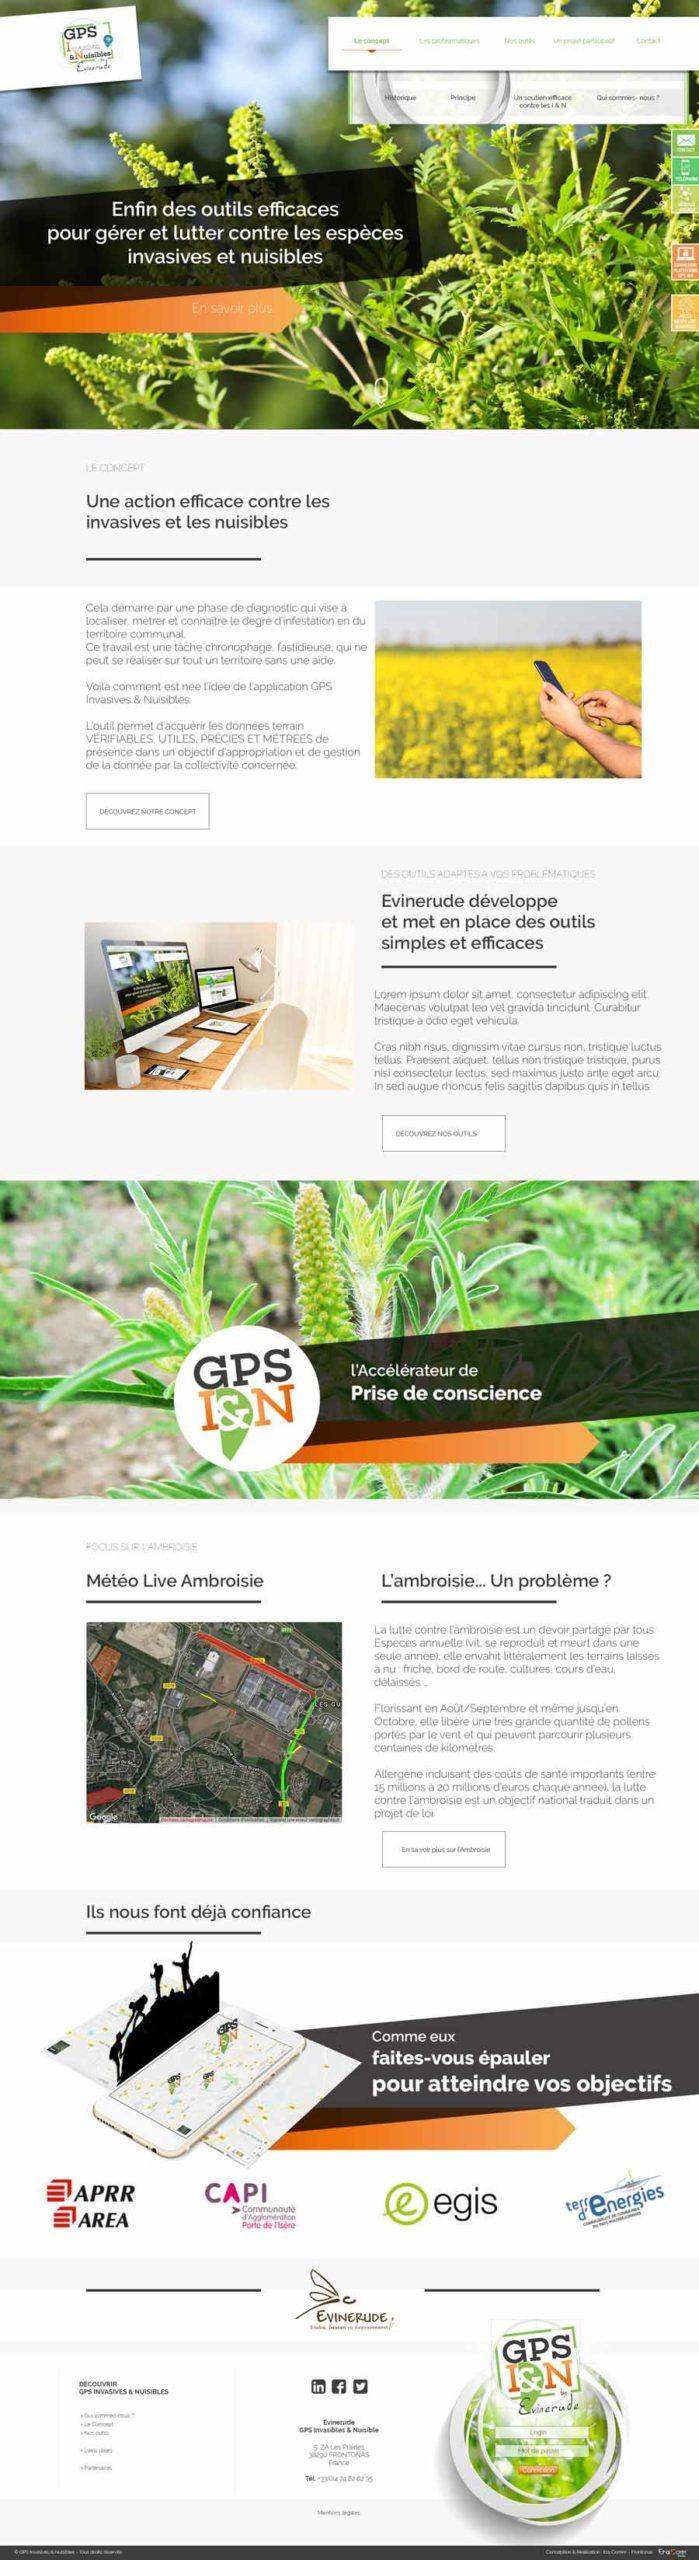 Site Plateforme GPS I&N